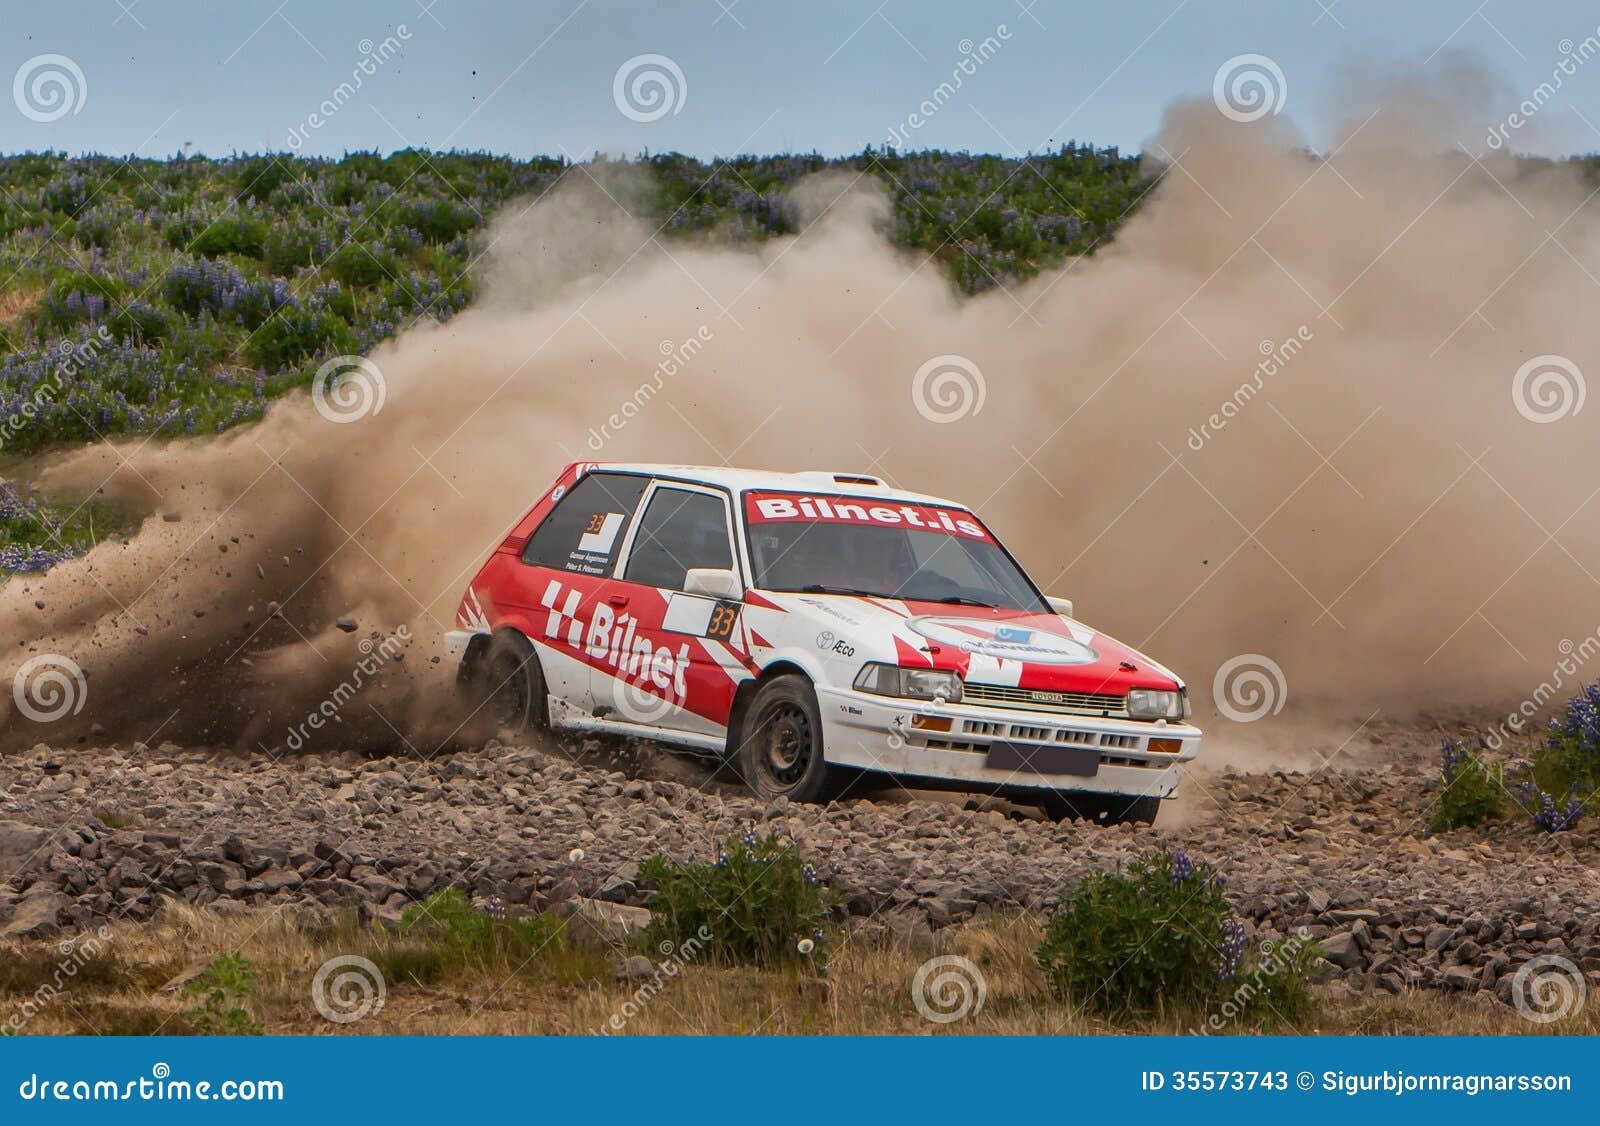 Alsko toyota corolla gti rallycar editorial stock photo - image of